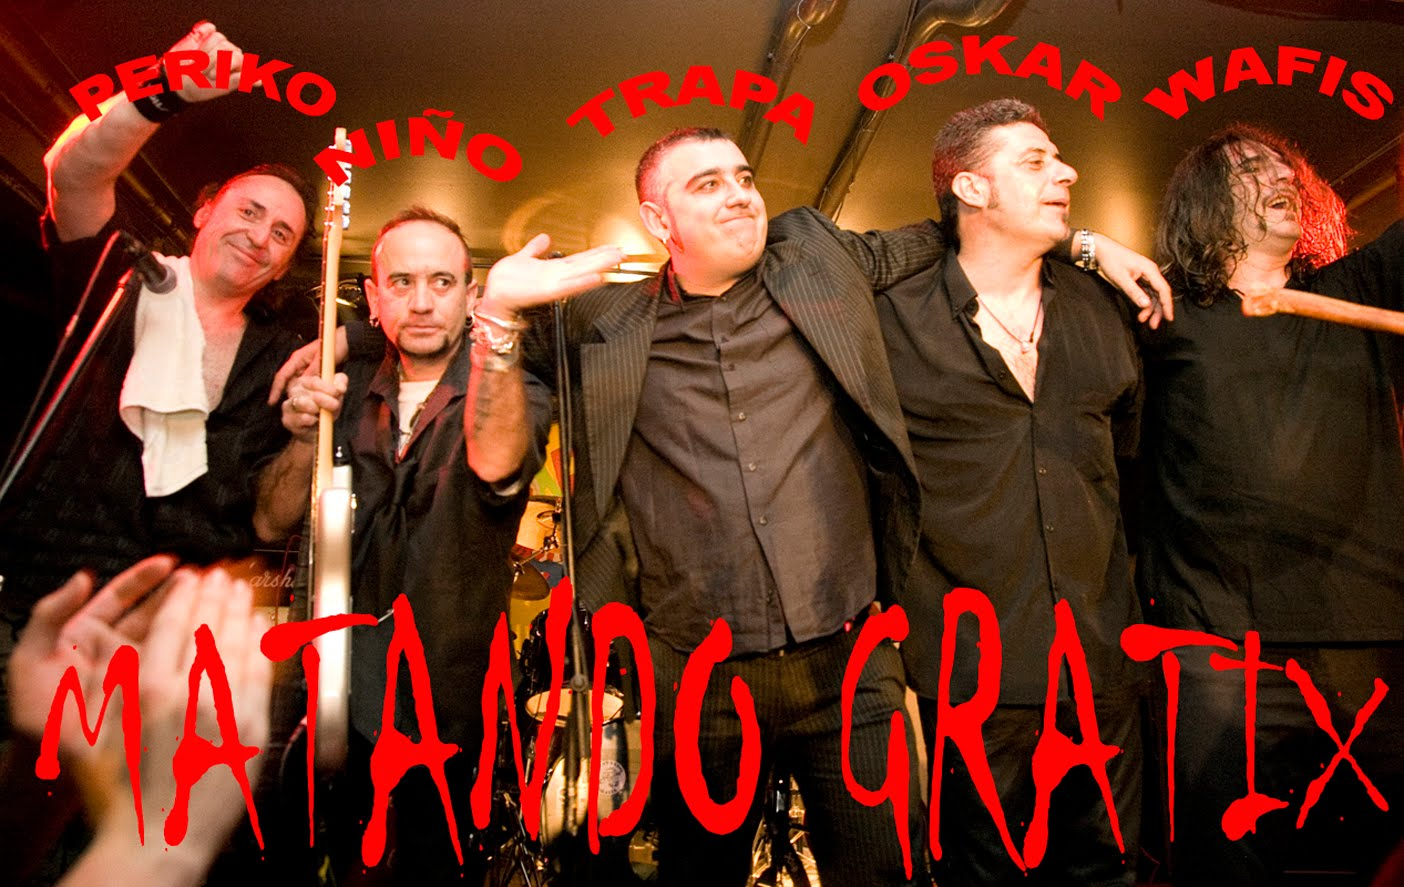 MATANDO GRATIX en directo sala Gruta 77. Foto: Archivo